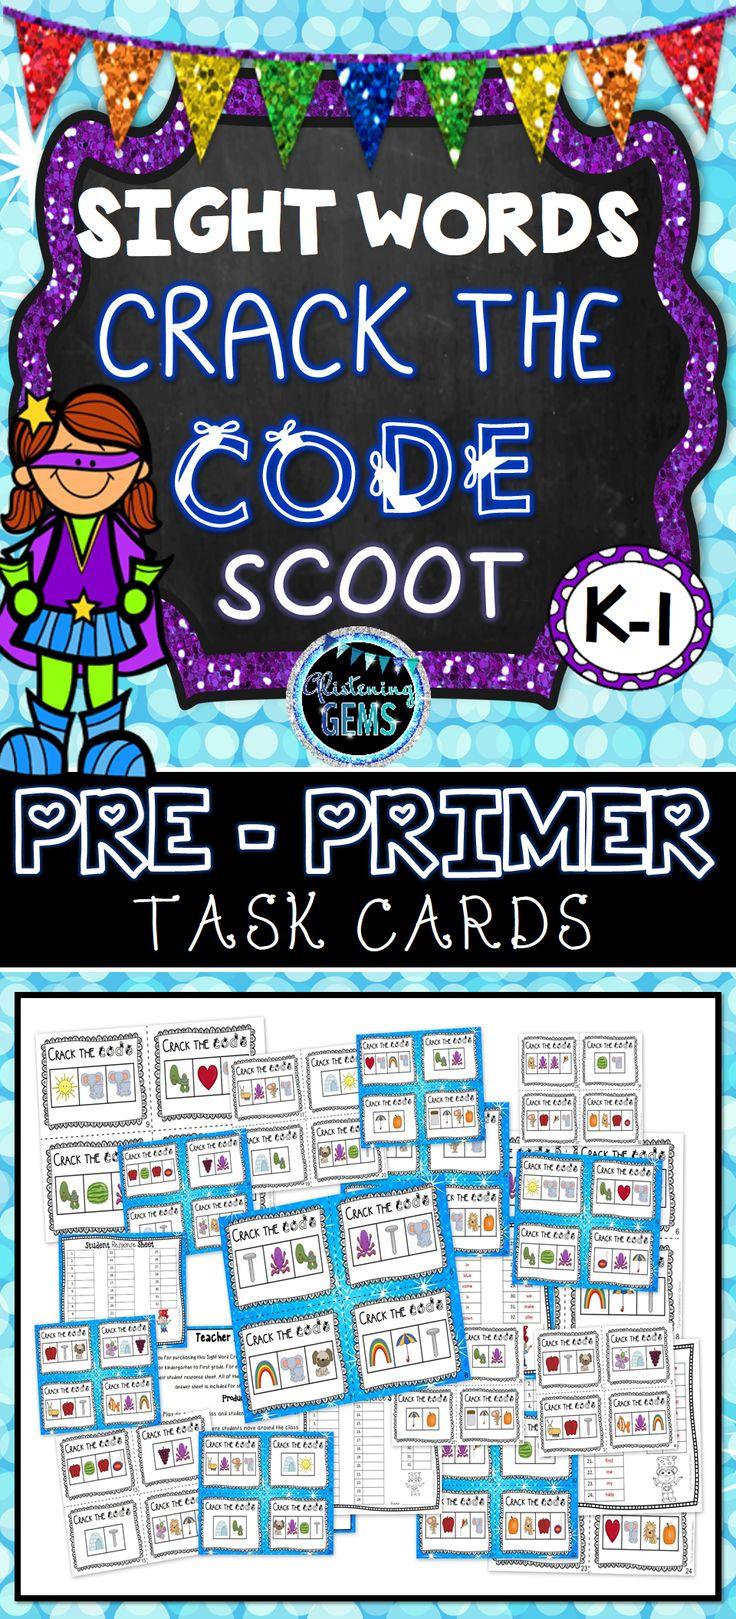 Pre-Primer Sight Word Task Cards {Scoot} - Crack the Code - K-1